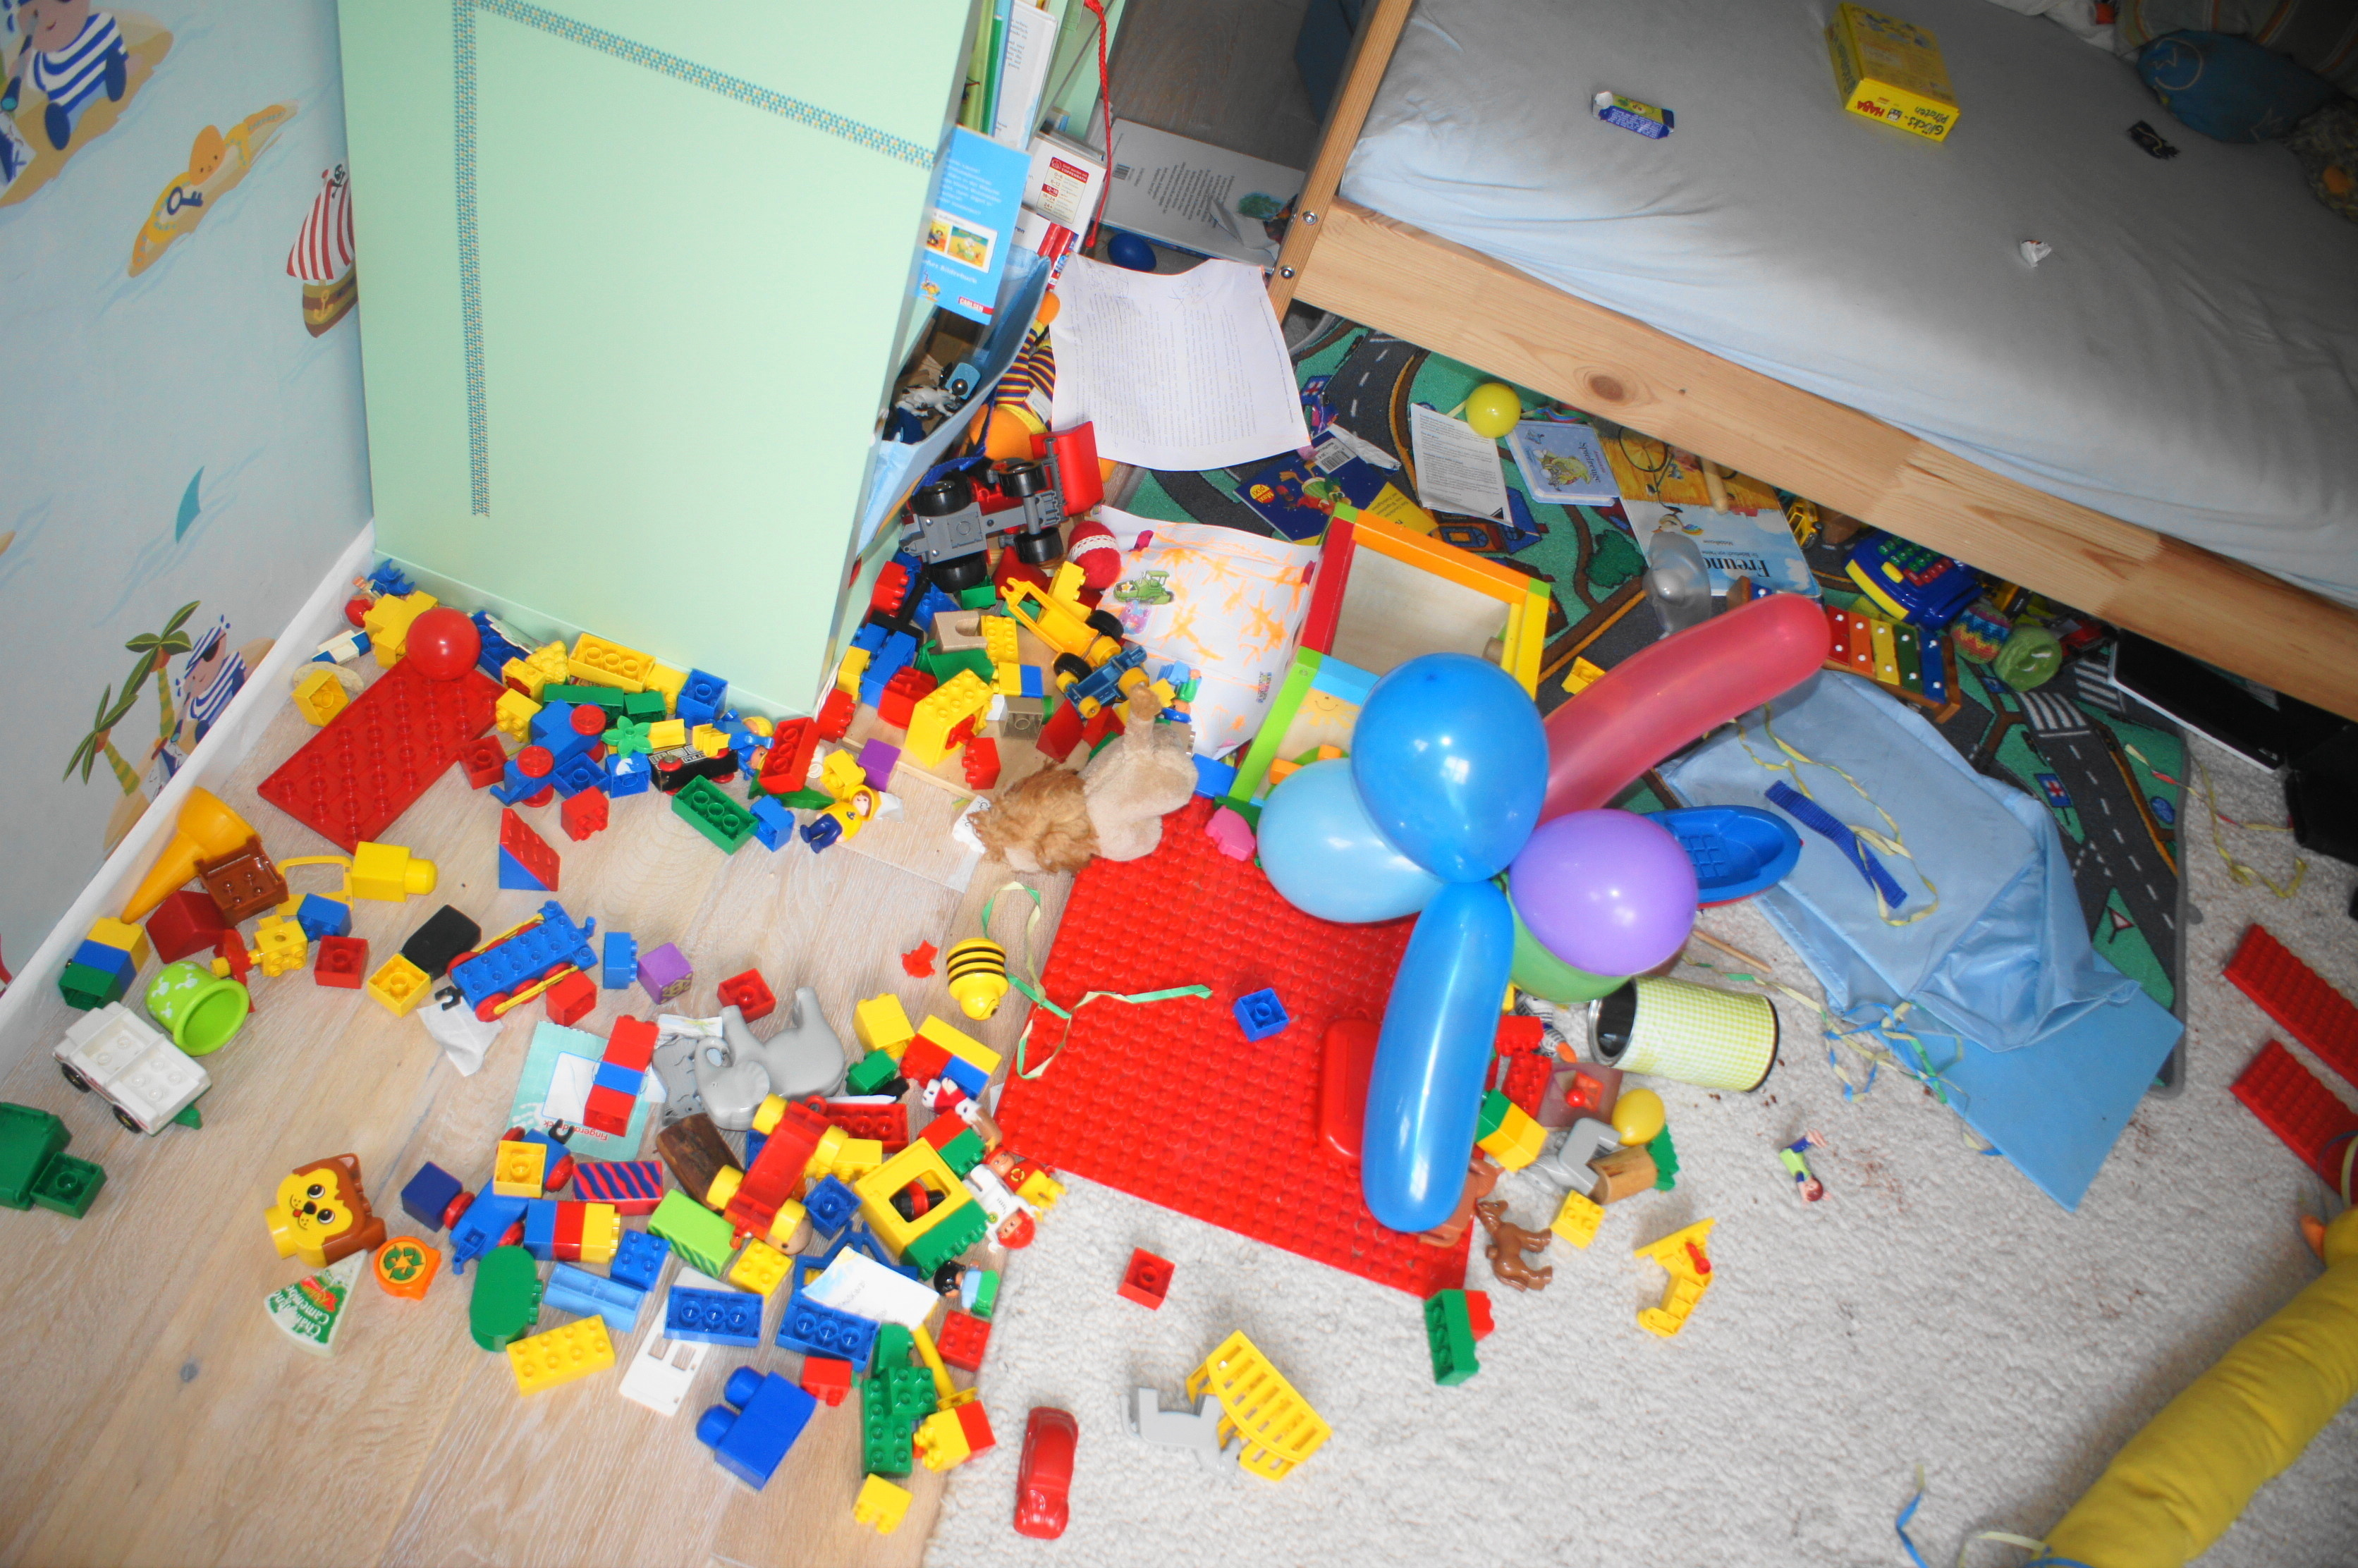 Chaos im Kinderzimmer, Topthema